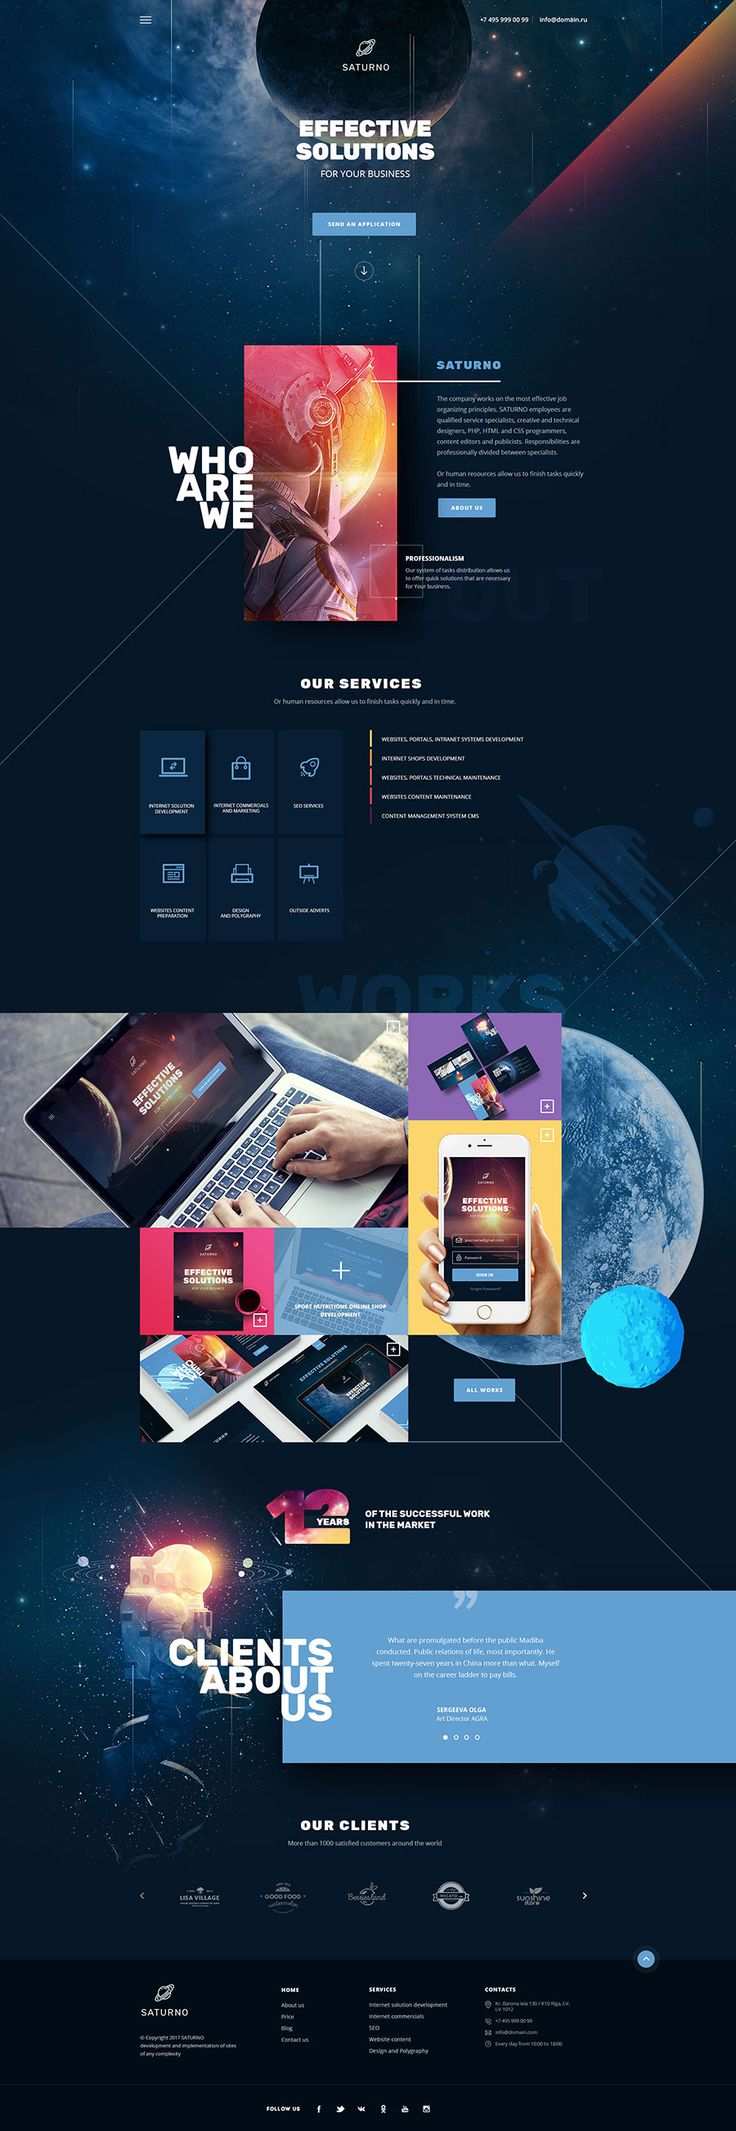 Saturno | Space Design | Portfolio | Dark and Light | PSD template #studio #unique #unusual • Download ➝ https://themeforest.net/item/saturno-space-design-portfolio-dark-and-light-psd-template/20928852?ref=pxcr